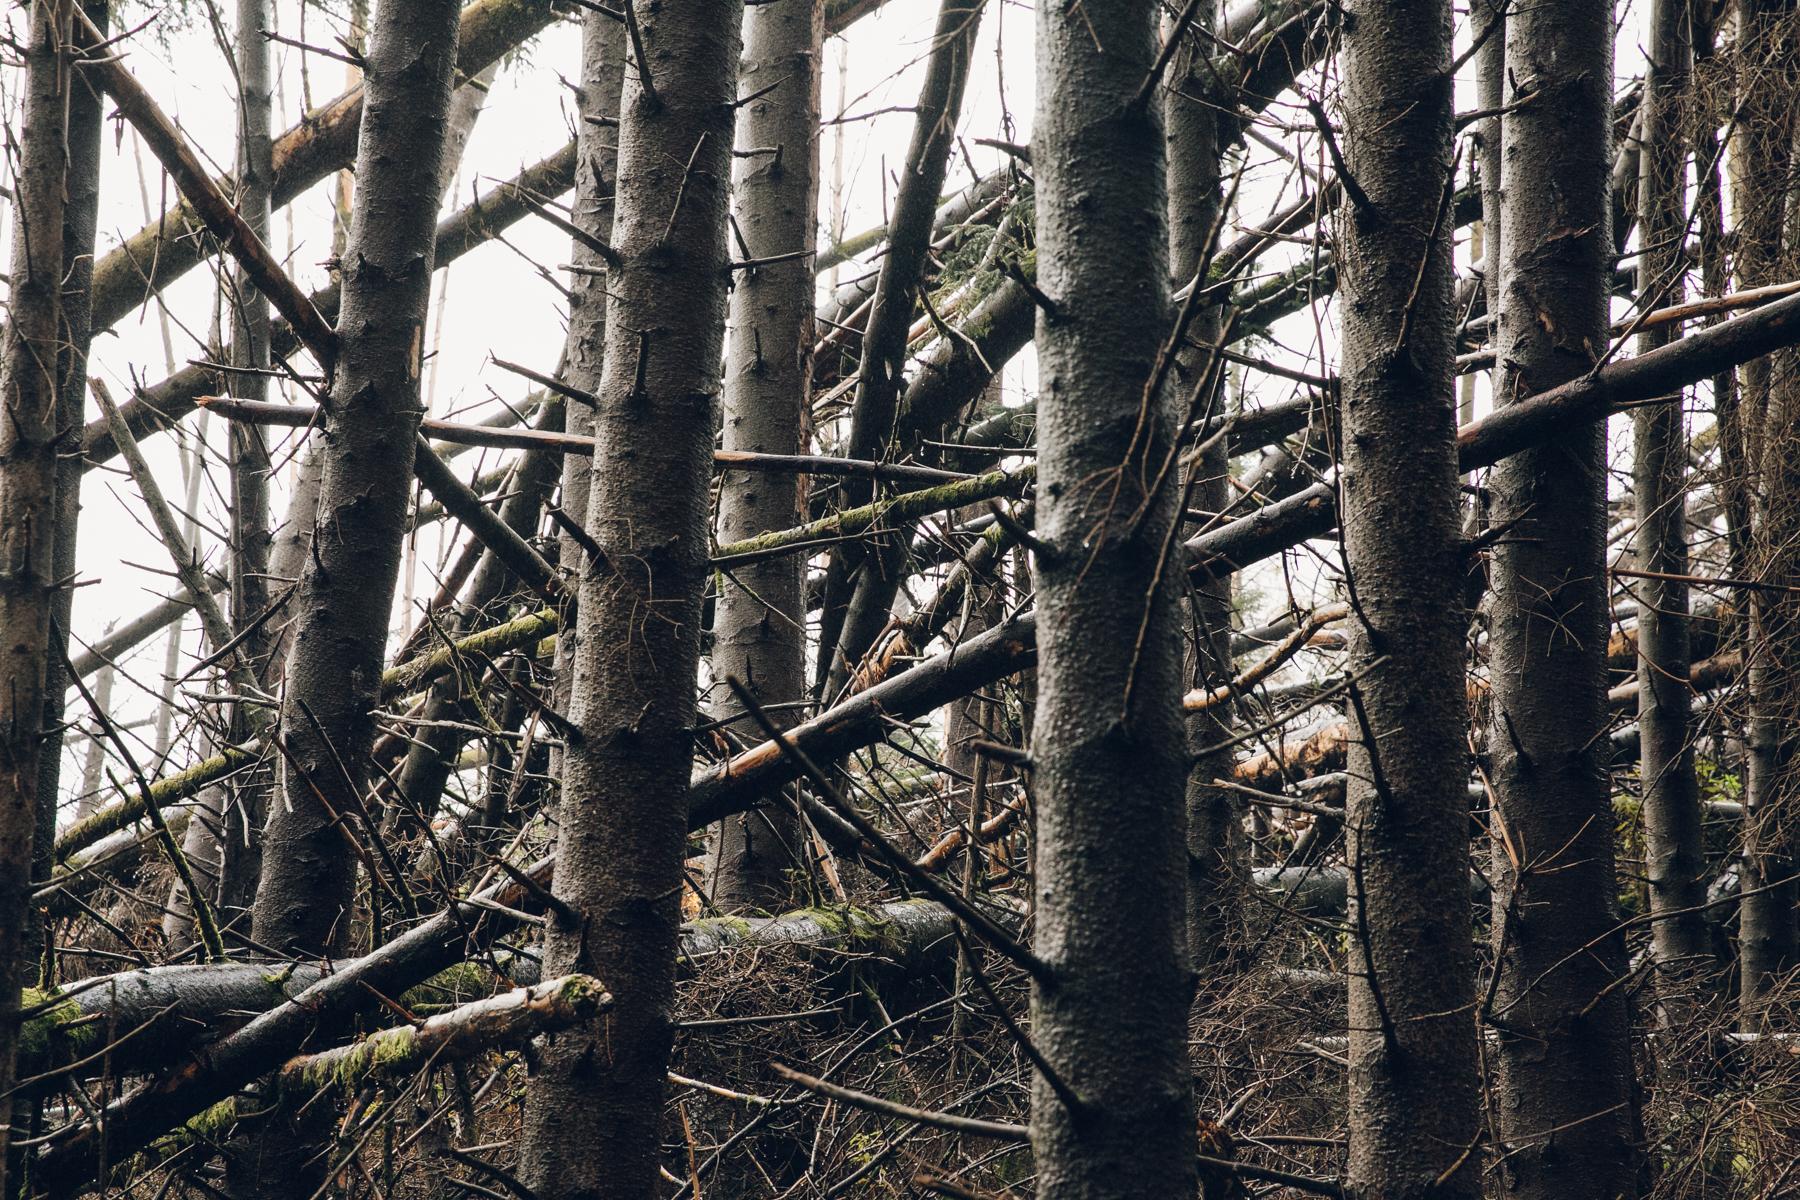 Pattern made by fallen trees.